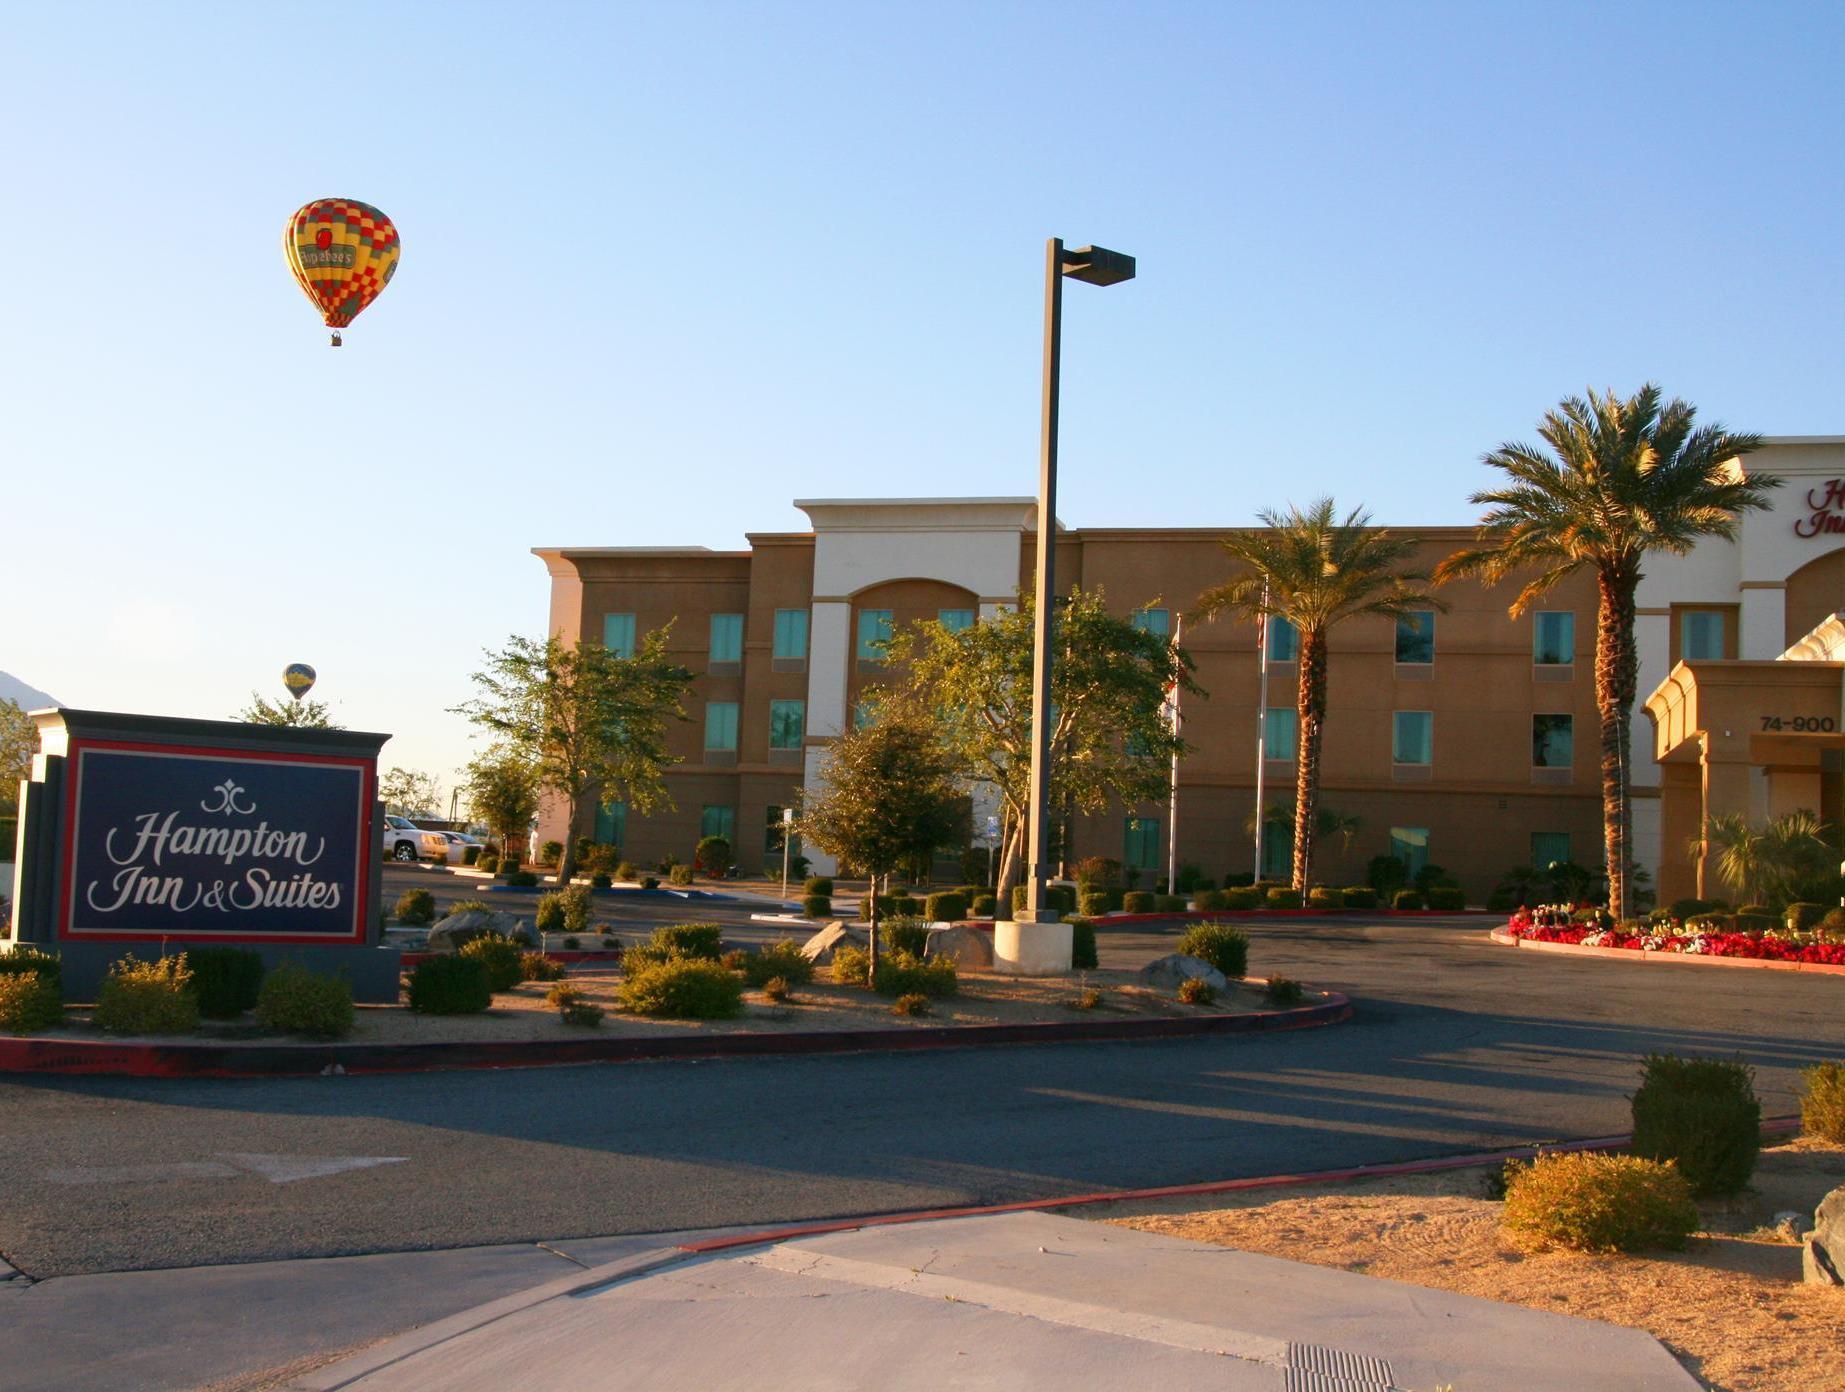 Hampton Inn And Suites Palm Desert